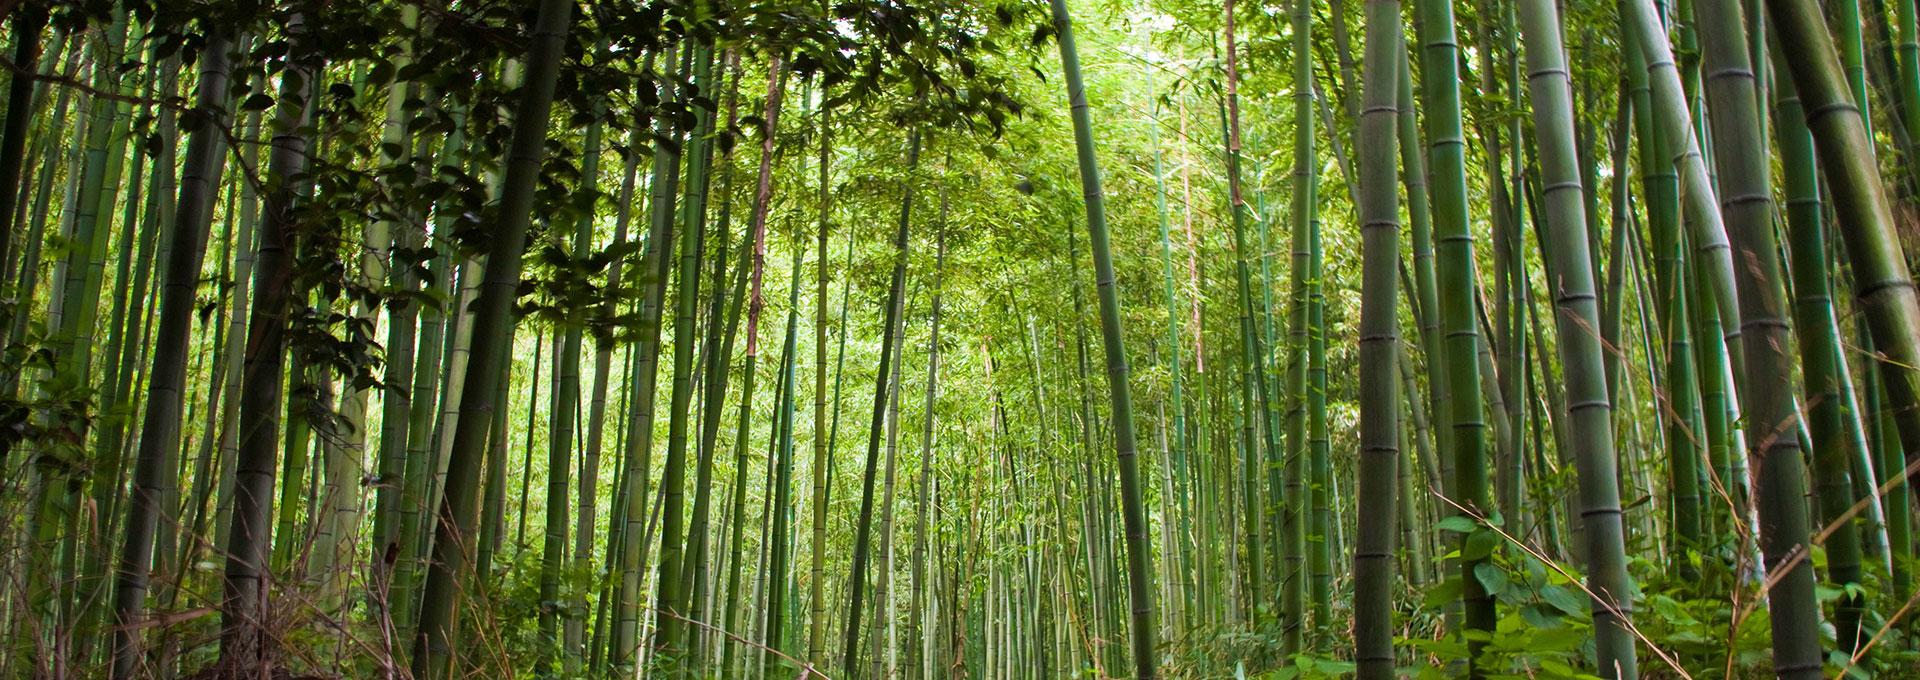 Tesoro Woods - MOSO® Bamboo Indoor Air Quality